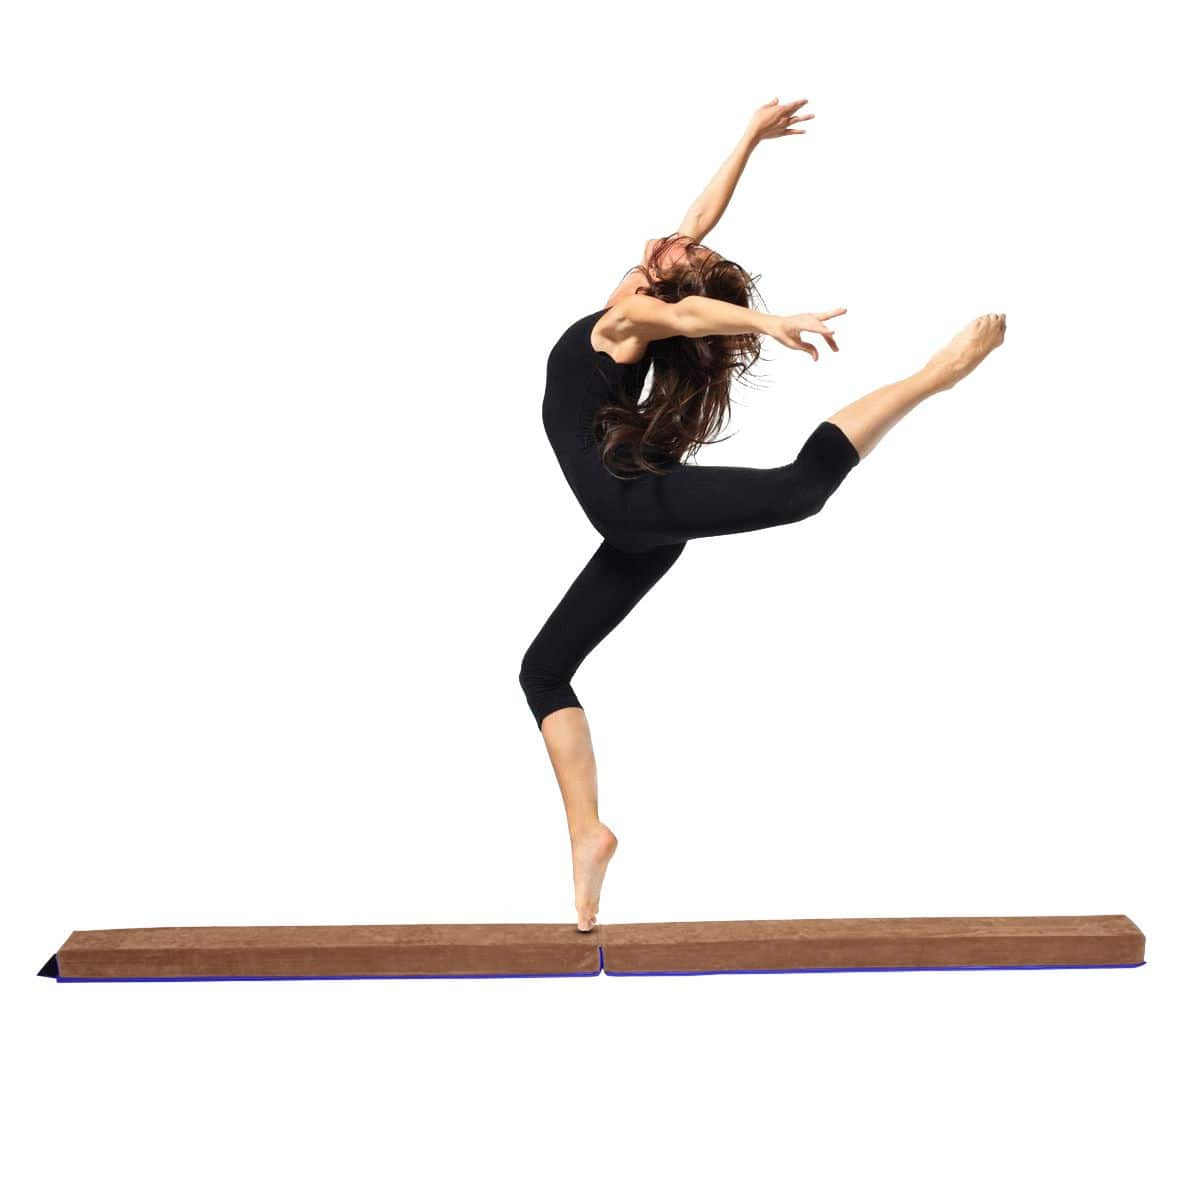 Costway 8' Sectional Gymnastics Floor Balance Beam $42.95 + Free Shipping